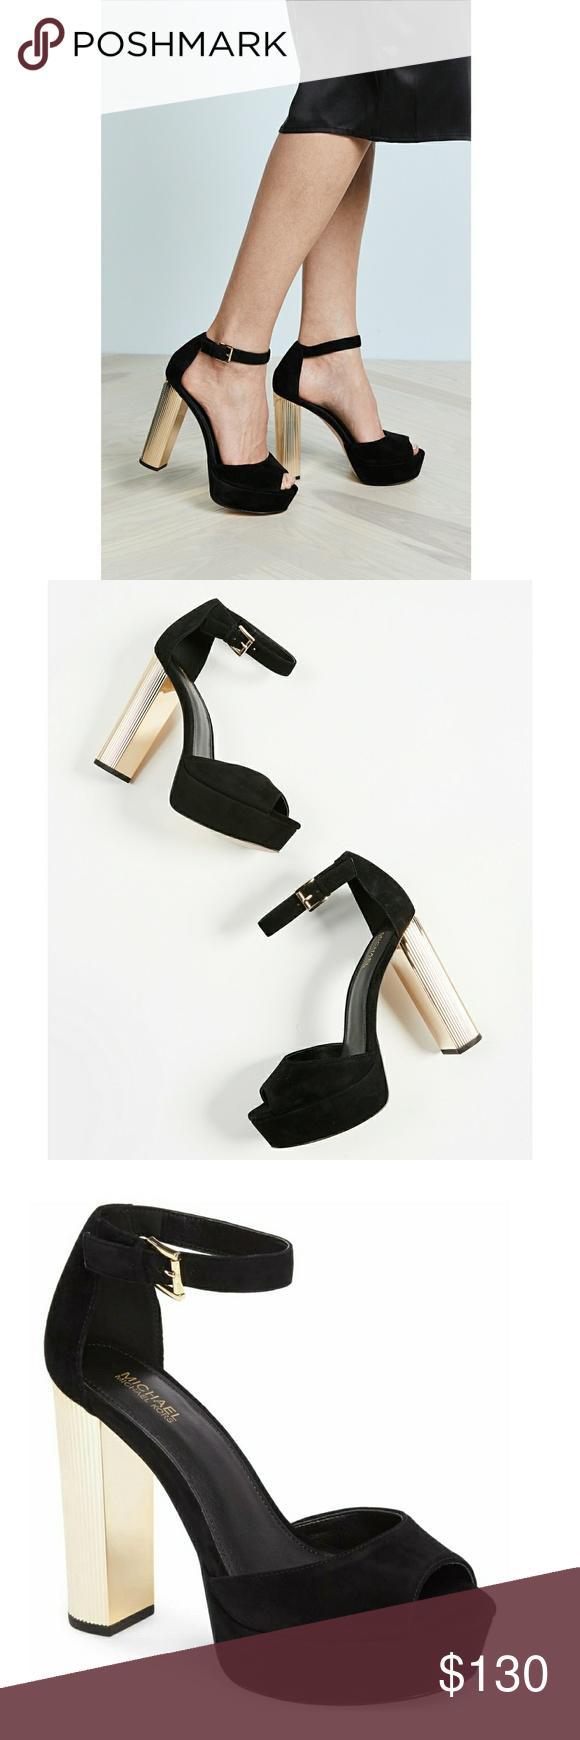 2a3e4e48430d MICHAEL KORS Paloma Platform Sandals Peep-Toe MICHAEL Michael Kors  Paloma  platform